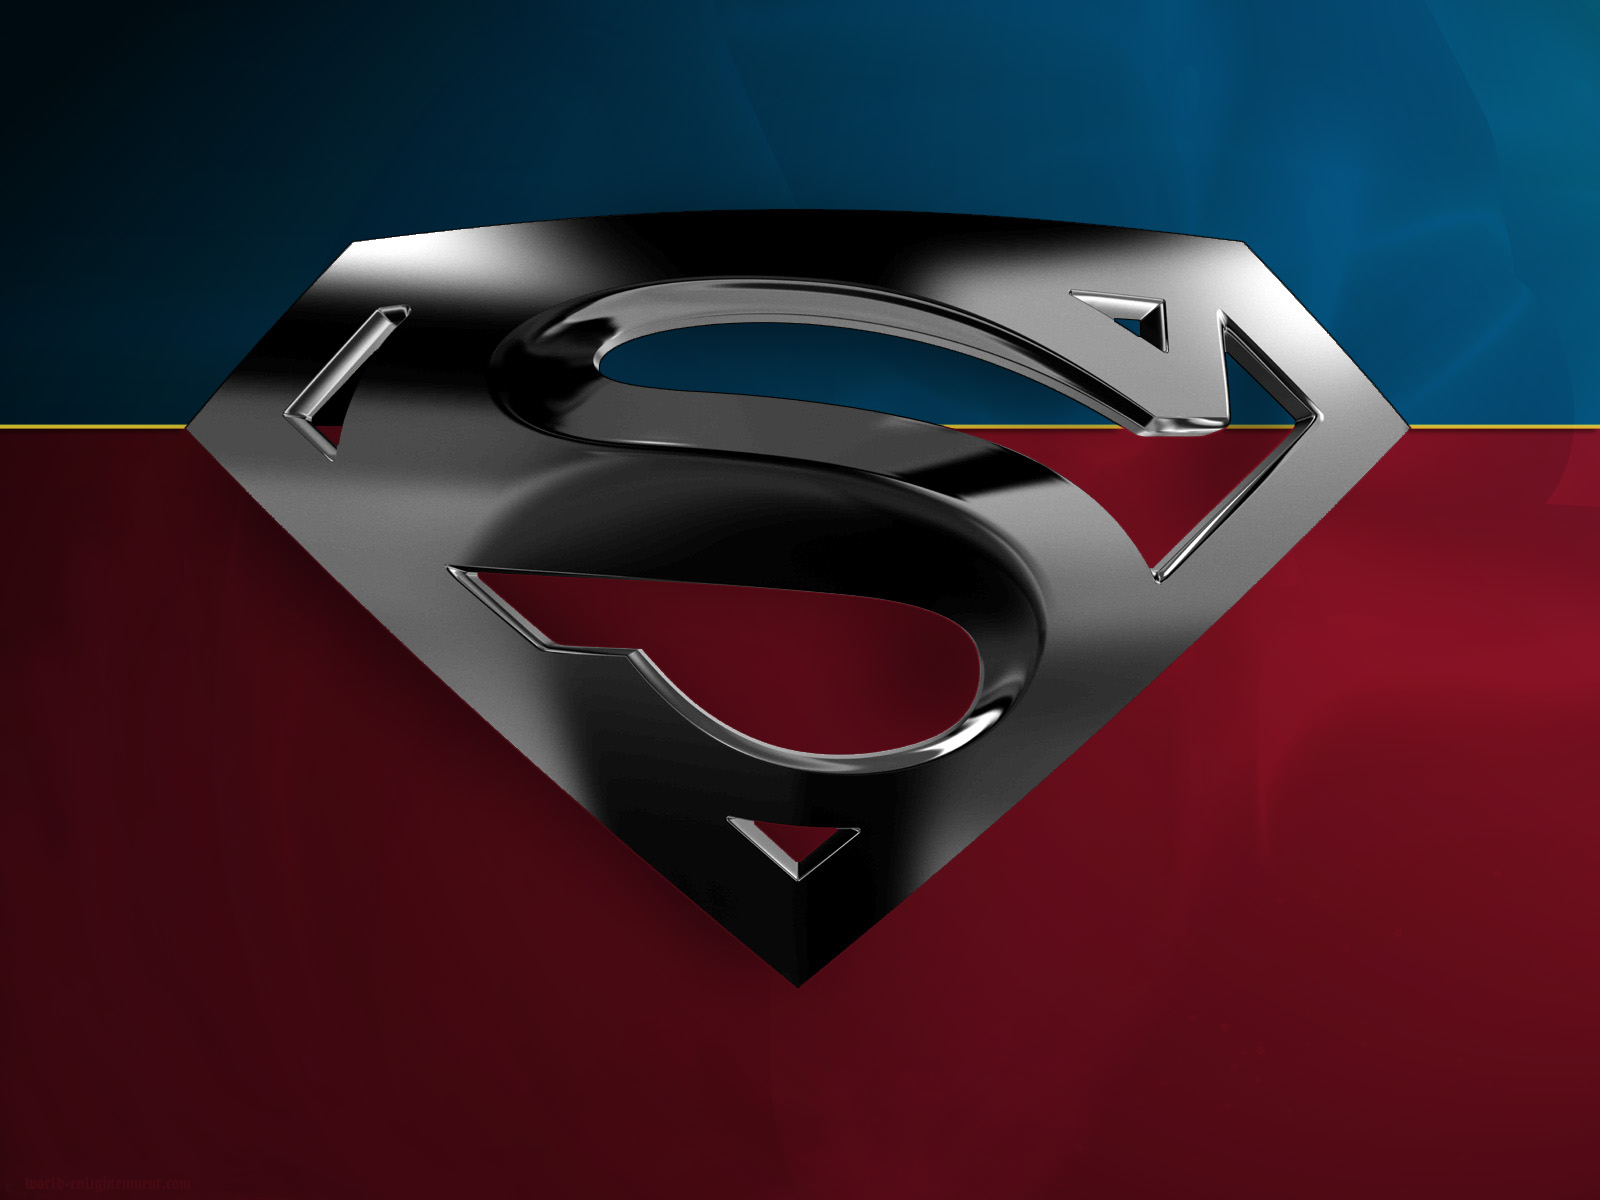 Superman Desktop Wallpaper 1280 x 1024 and more 1600x1200